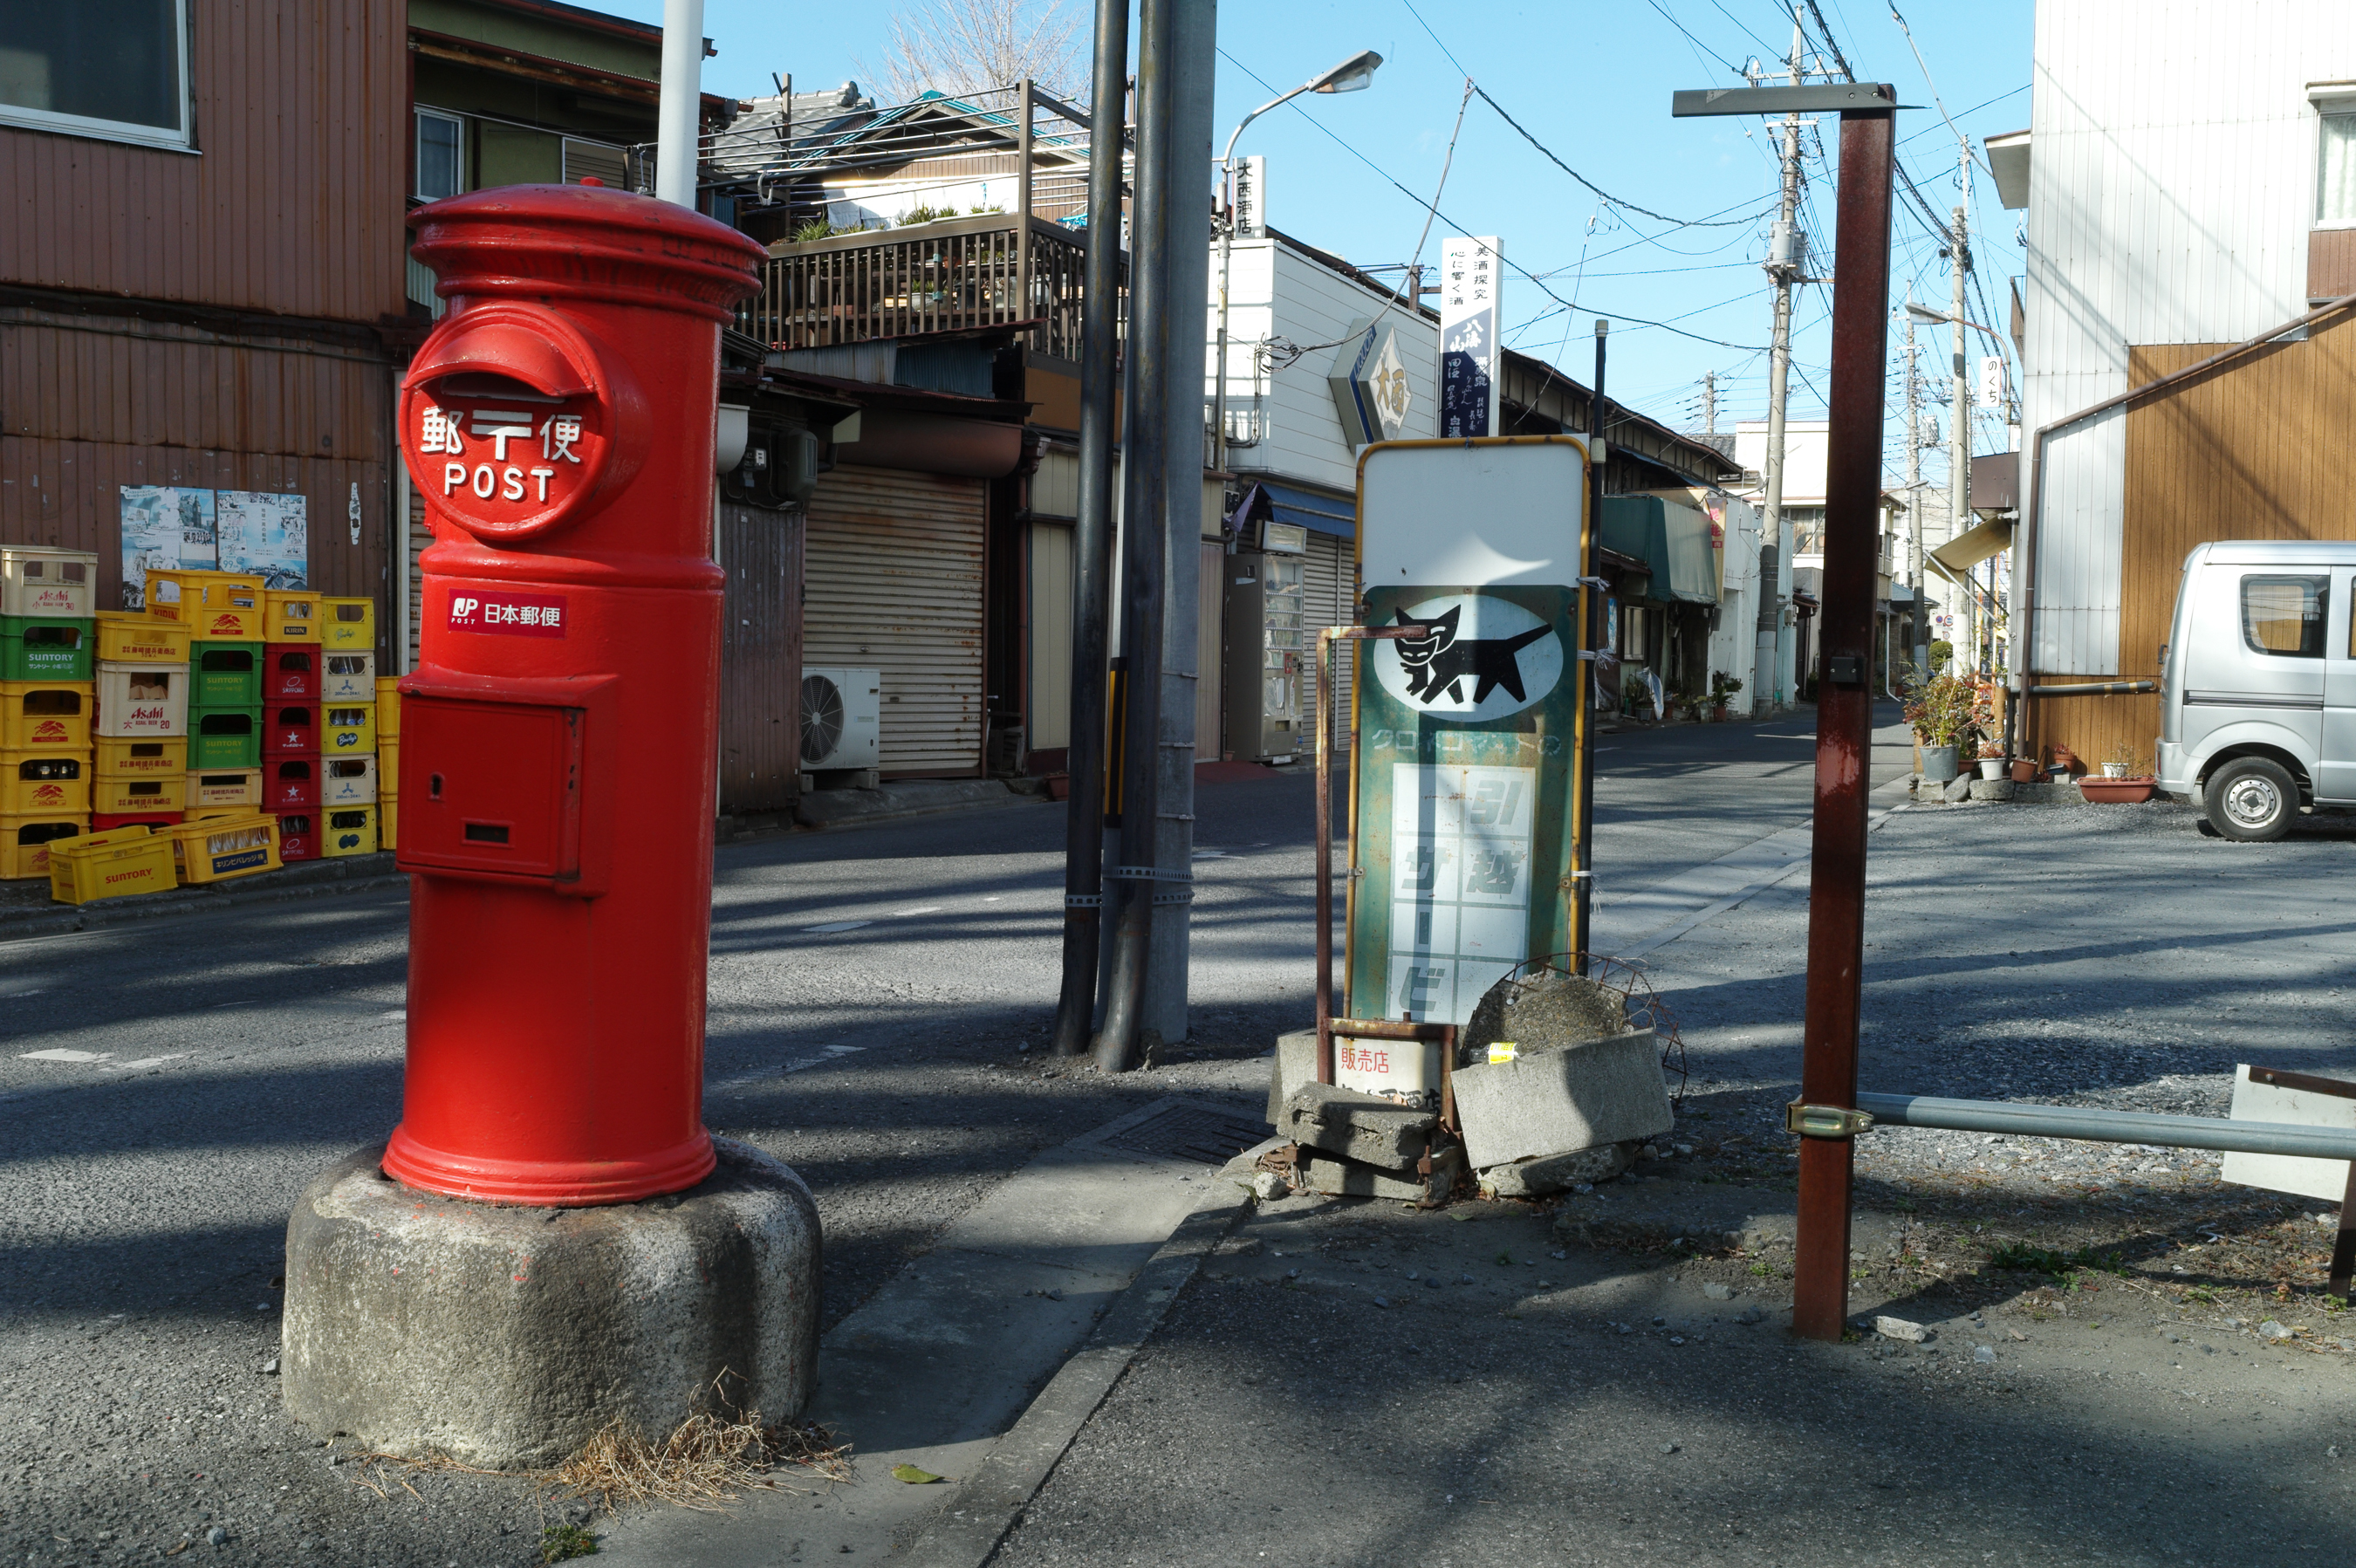 f:id:aoyama-takuro:20180211212253j:plain